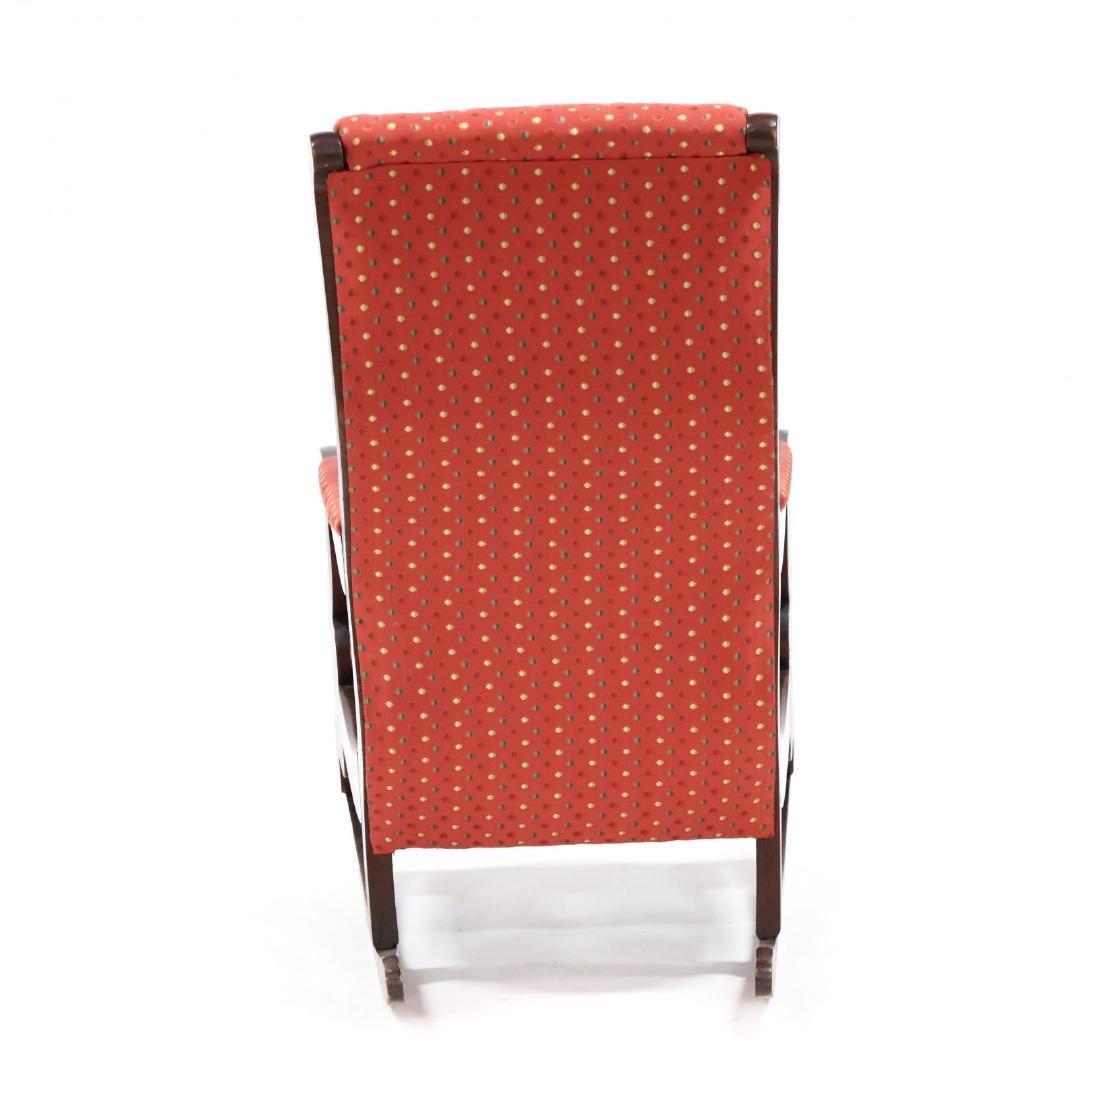 att. Thomas Day, American Classical Rocking Chair - 4